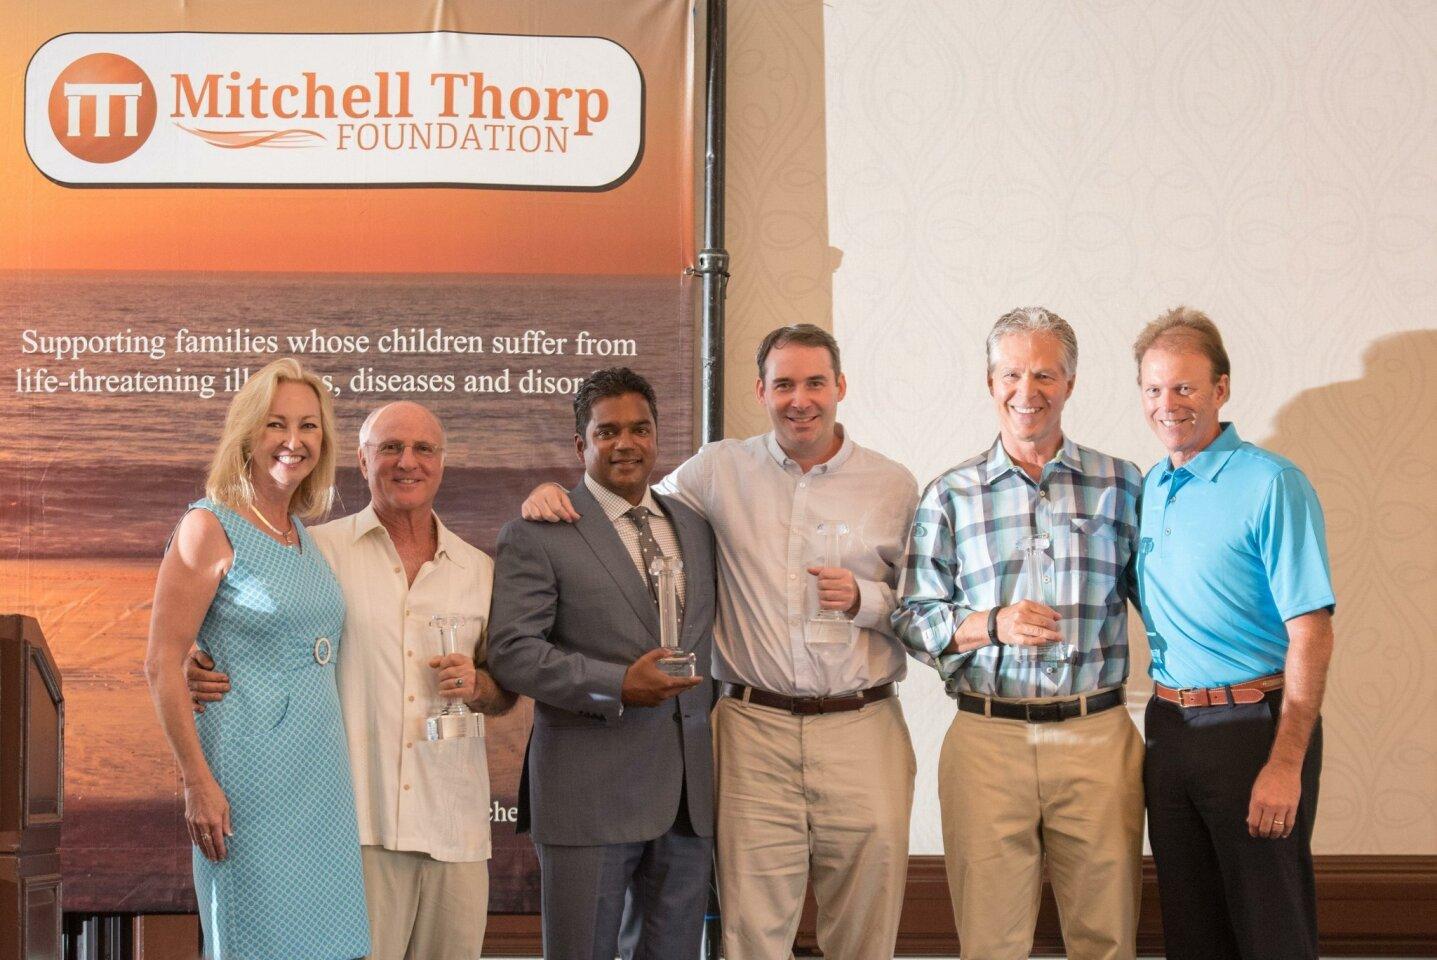 Pillars of Hope Honorees: Beth Thorp, Dr. Glenn Frieder, Dr. Sanjay Ghosh, Dr. John Crawford, Gordon Merkle and Brad Thorp